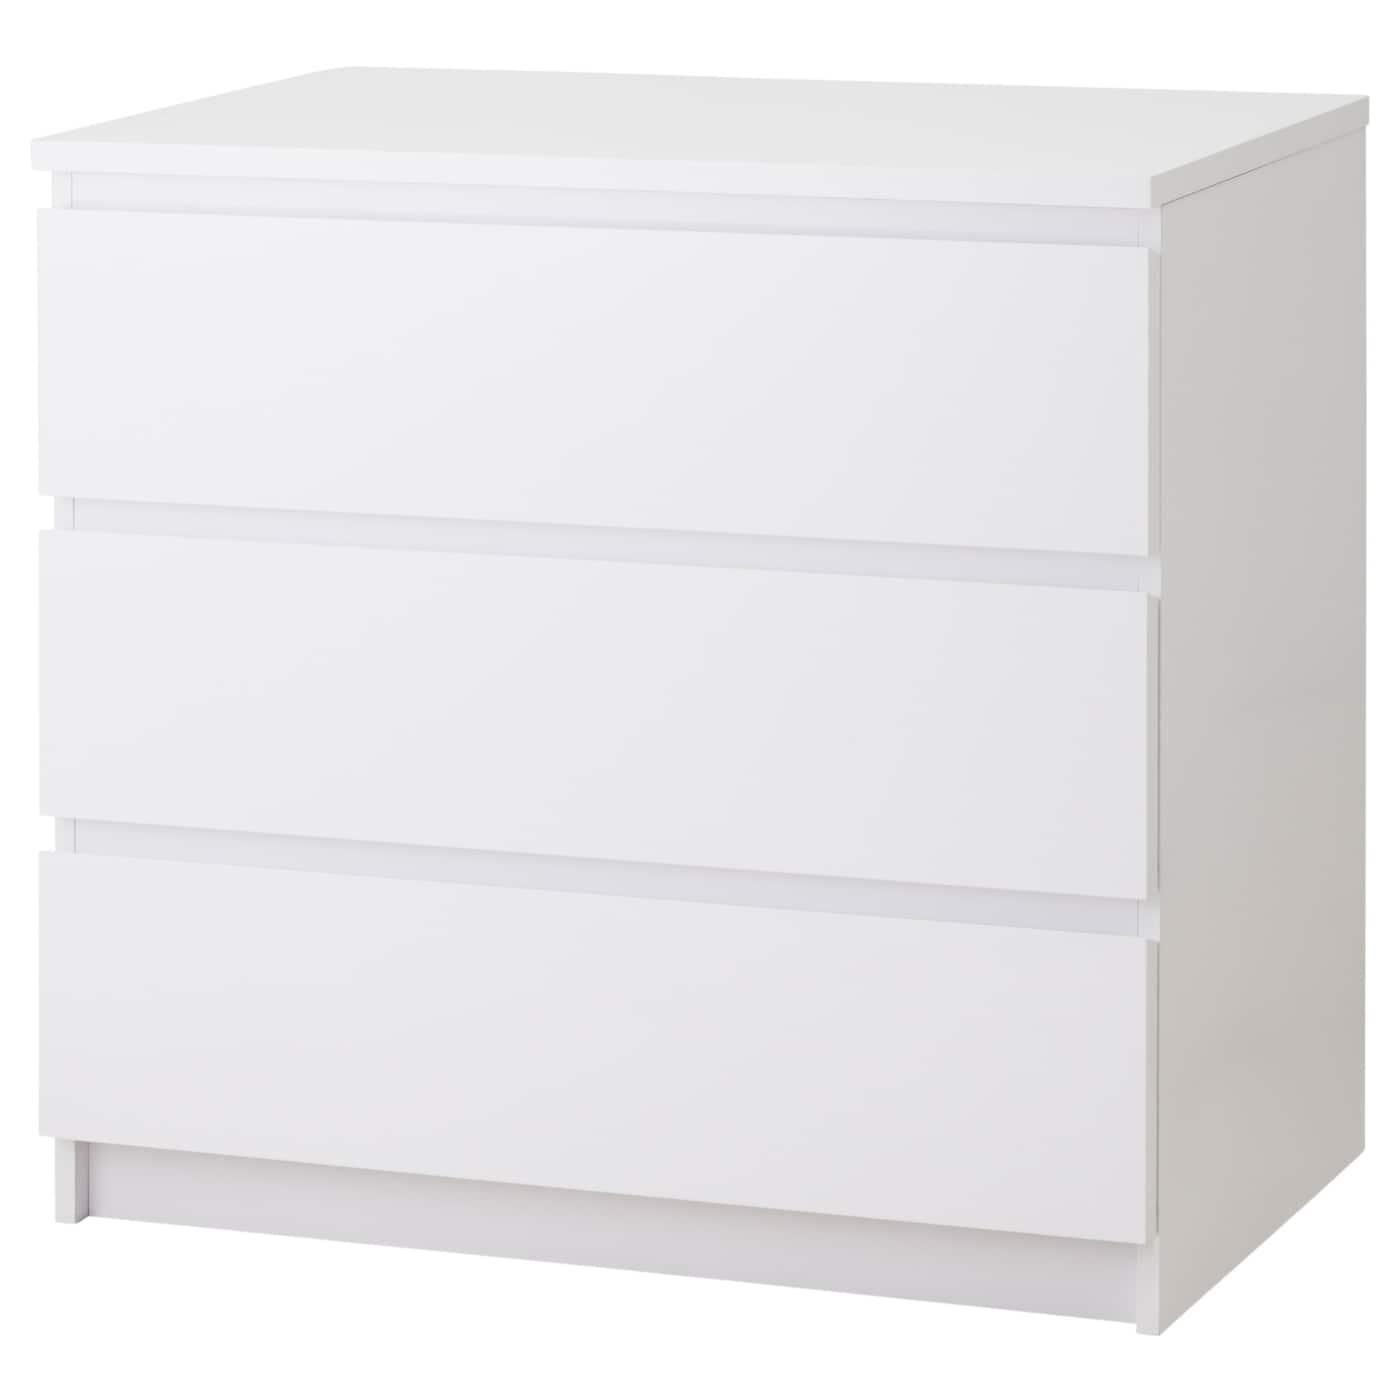 Ladenkasten & Slaapkamerkasten - IKEA